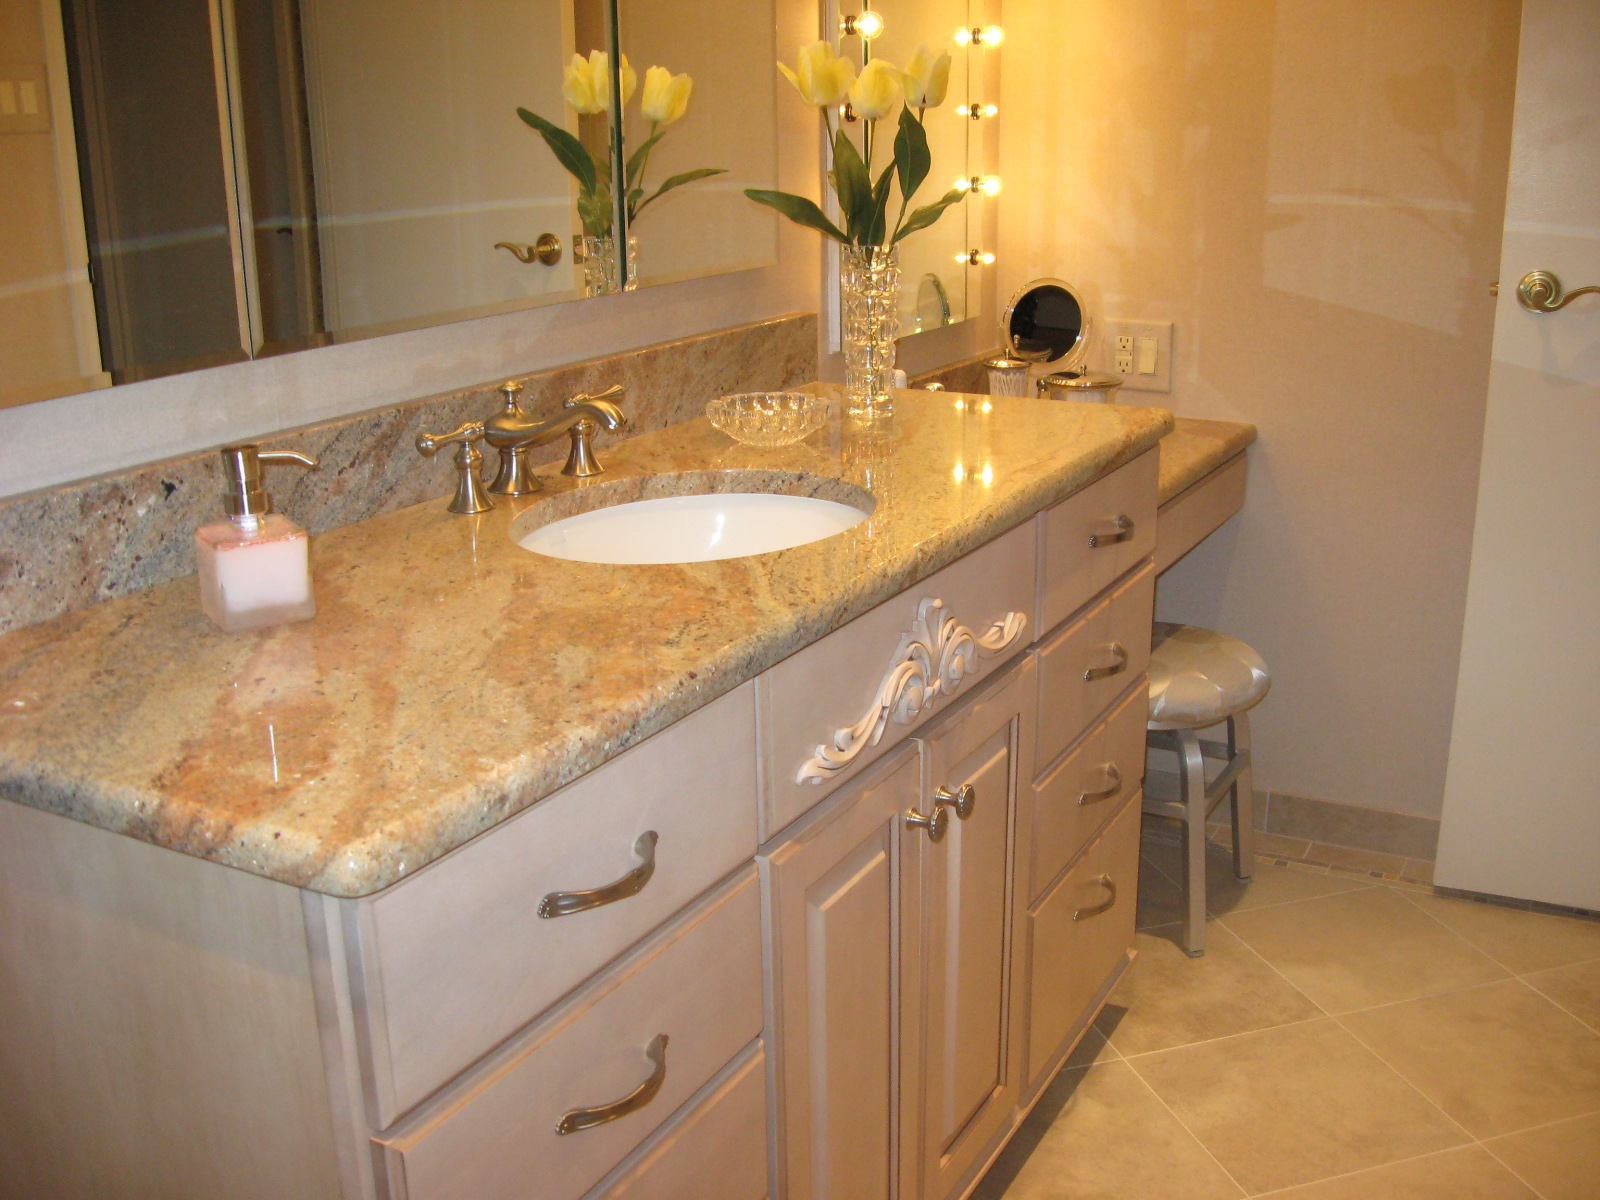 Bahtroom Vanity Bath Counter Top Bathroom Granite